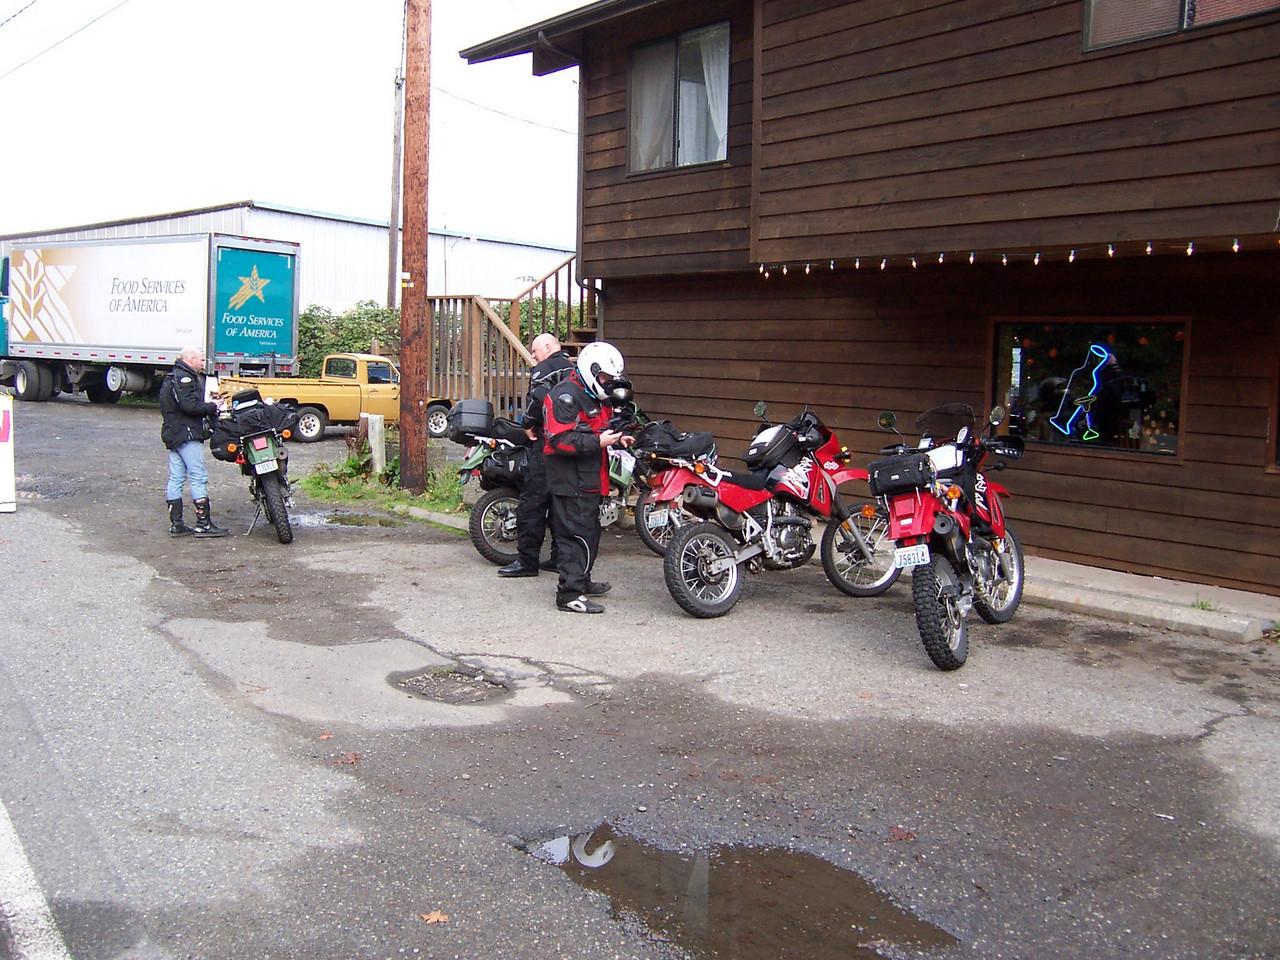 Union Tavern, on Hood canal. Steve, Dan, & Sean